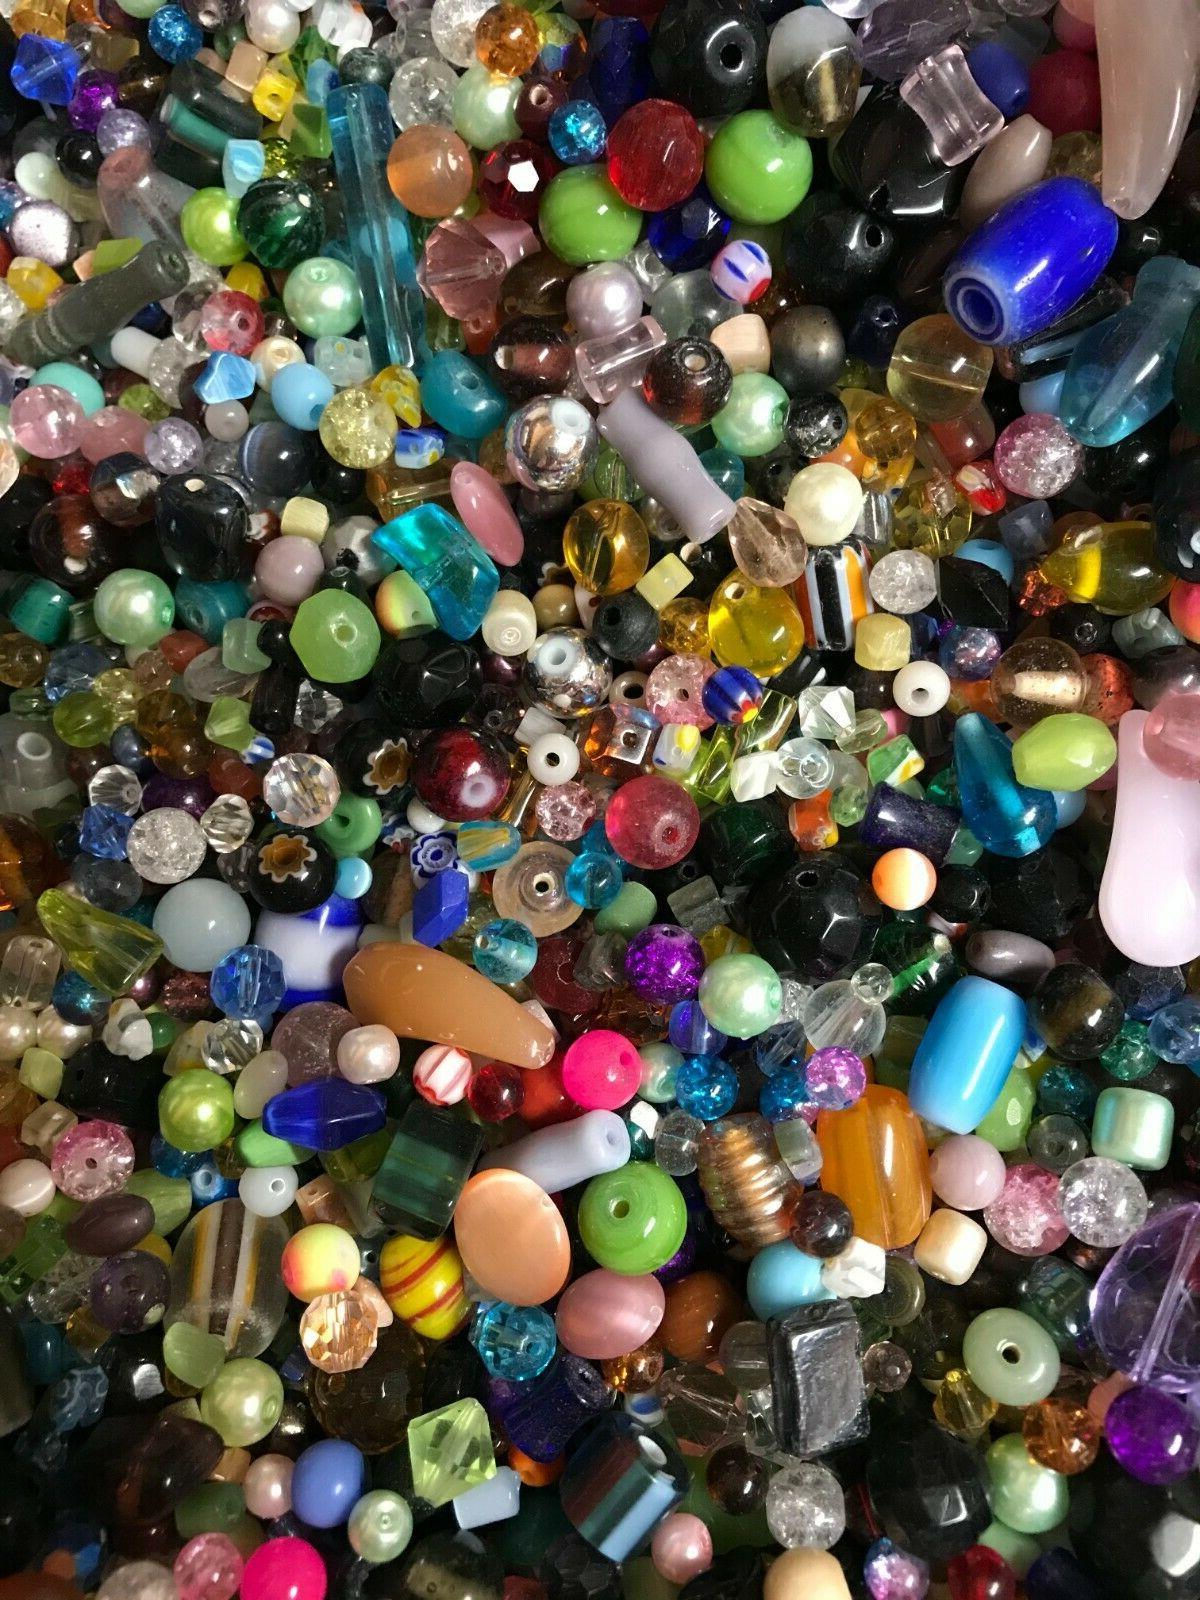 ~100~ Piece Loose Beads Mixed Craft Gift*